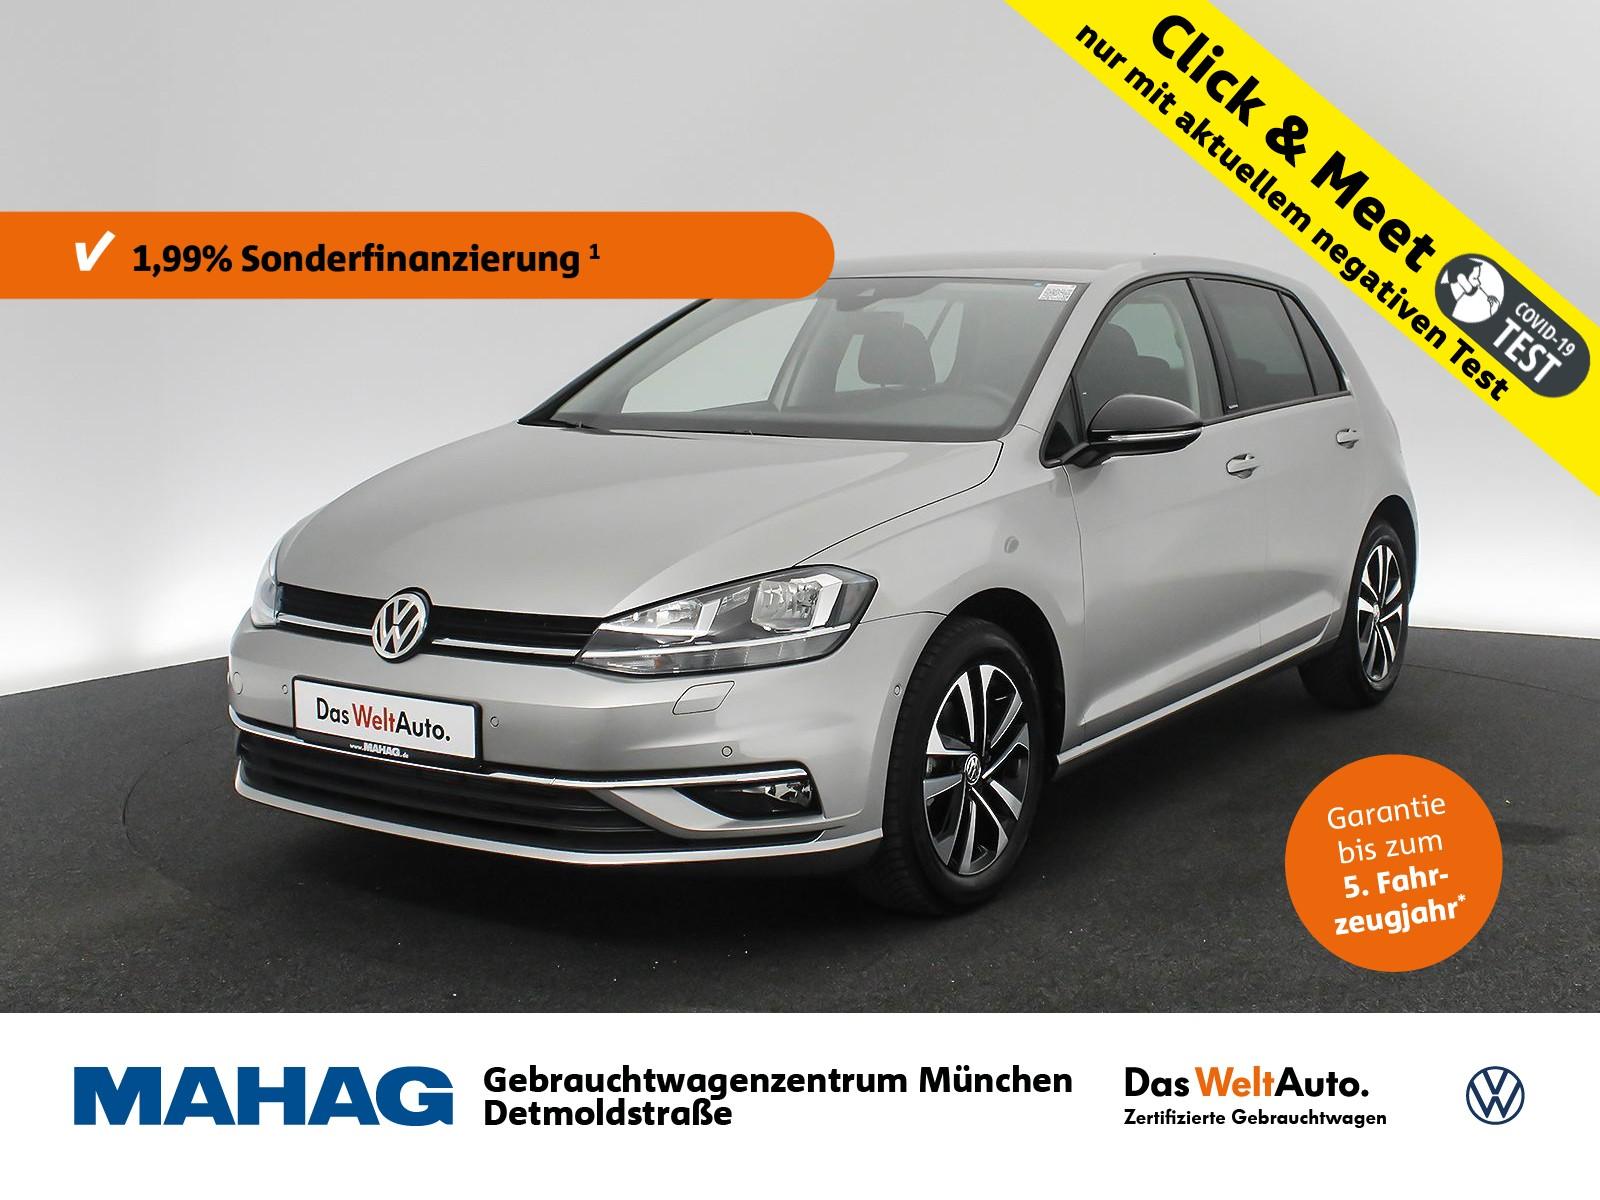 Volkswagen Golf VII 1.0 TSI IQ.DRIVE Navi Sitzhz. ParkAssist LightAssist FrontAssist 16Zoll 6-Gang, Jahr 2019, Benzin